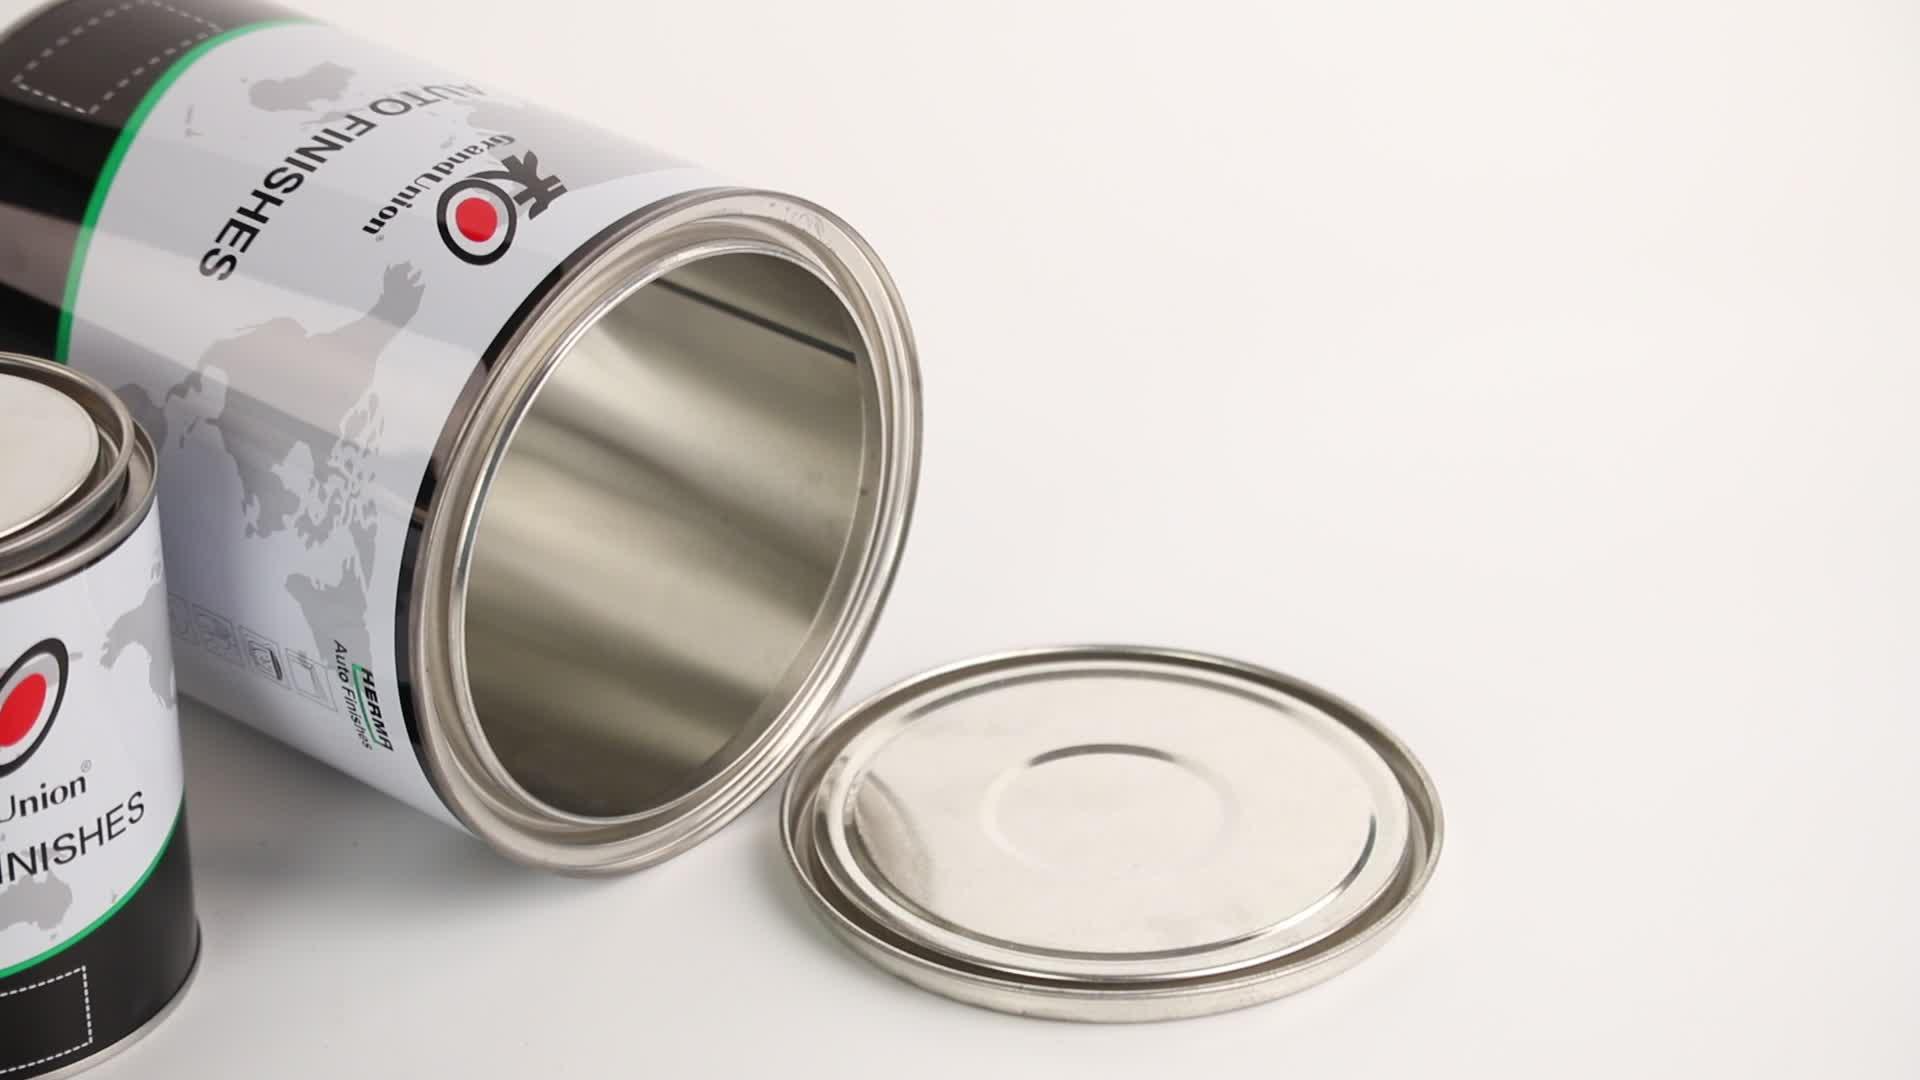 Silber 1c Farbe Logo Food Grade Verpackung kleines Metall rund / Sqaure Blechdose Tee kann